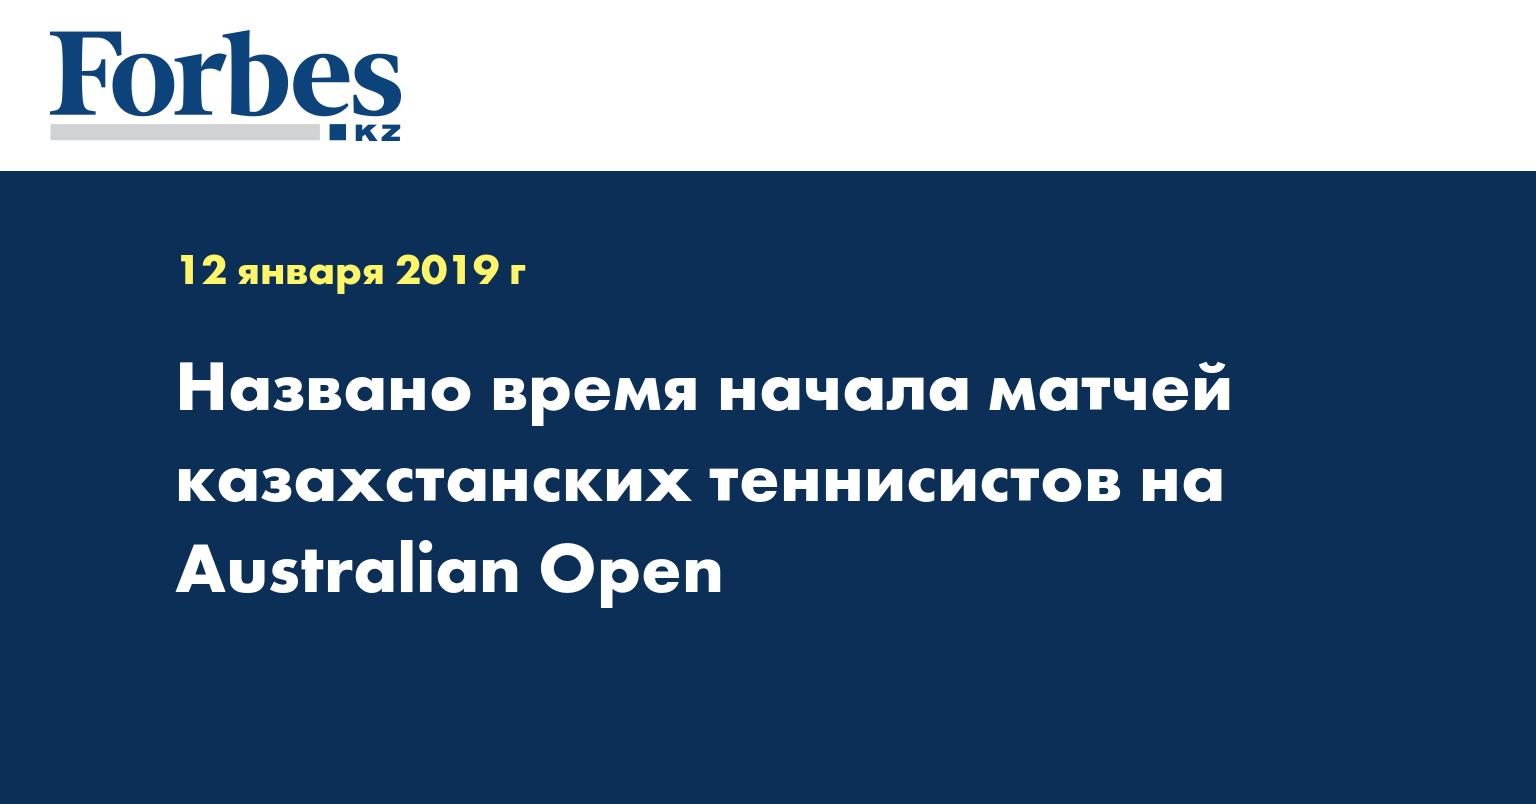 Названо время начала матчей казахстанских теннисистов на Australian Open